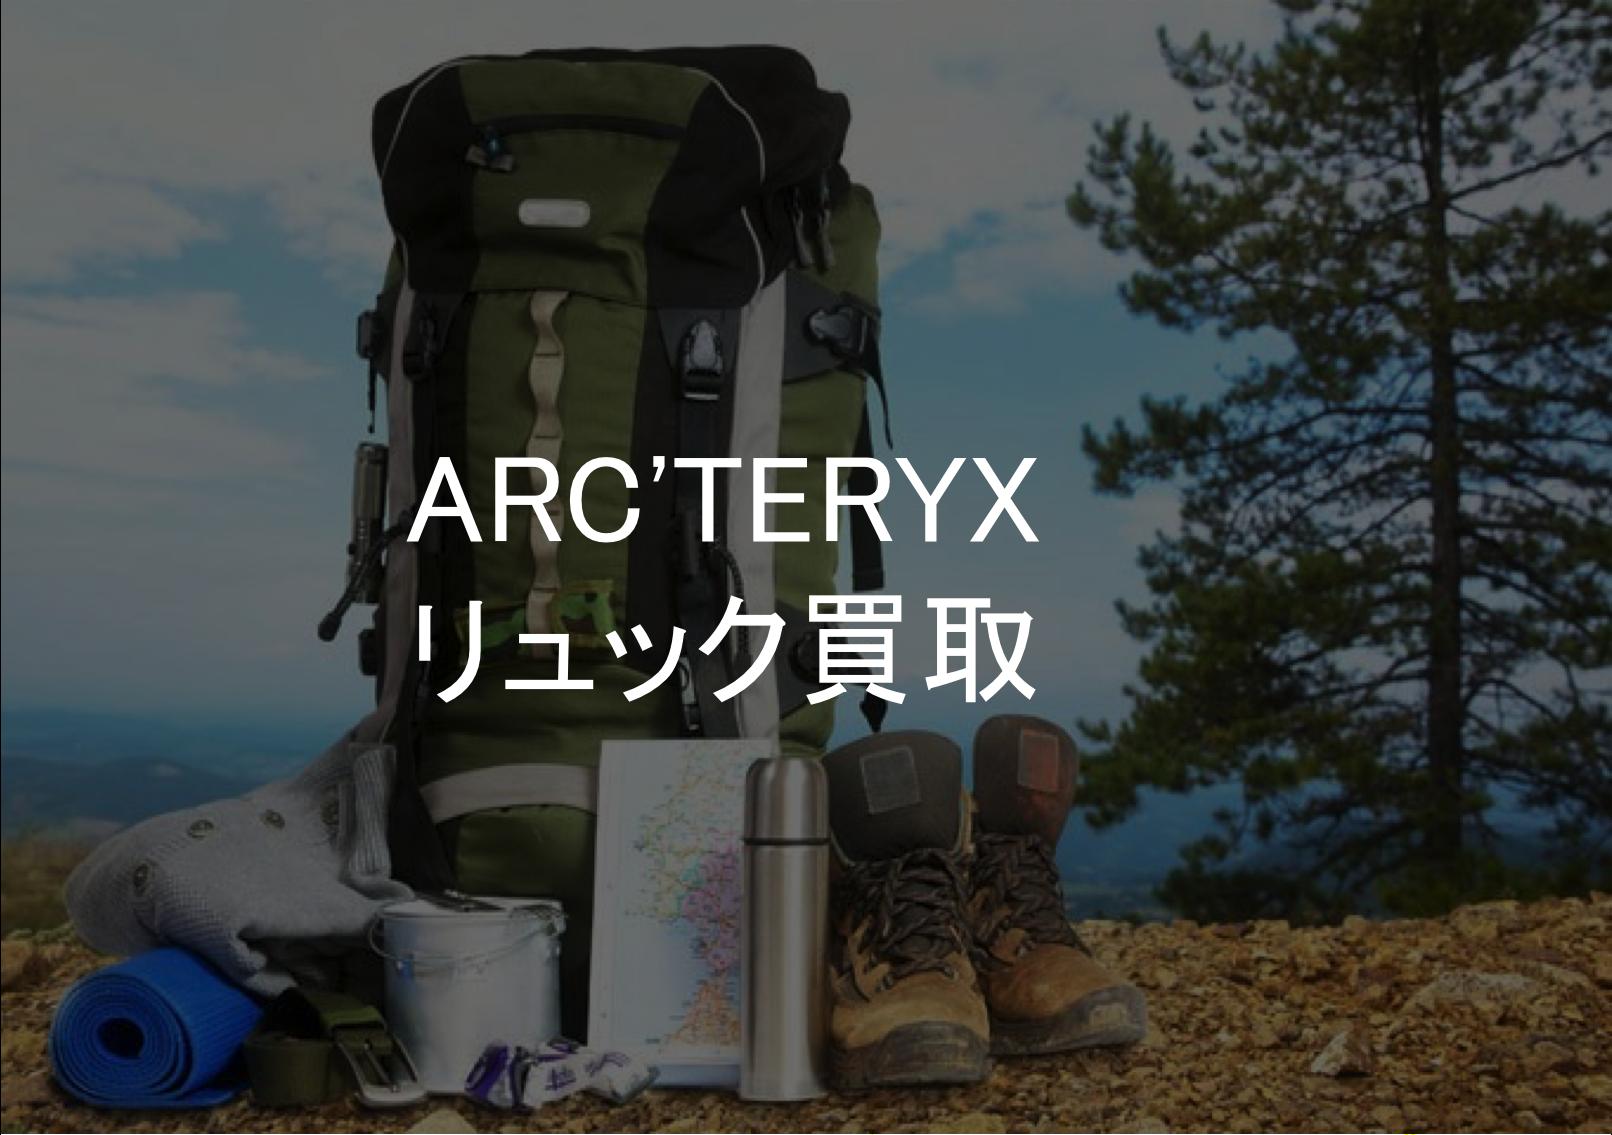 ARC'TERYX(アークテリクス)リュックサック/バックパック買取なら!